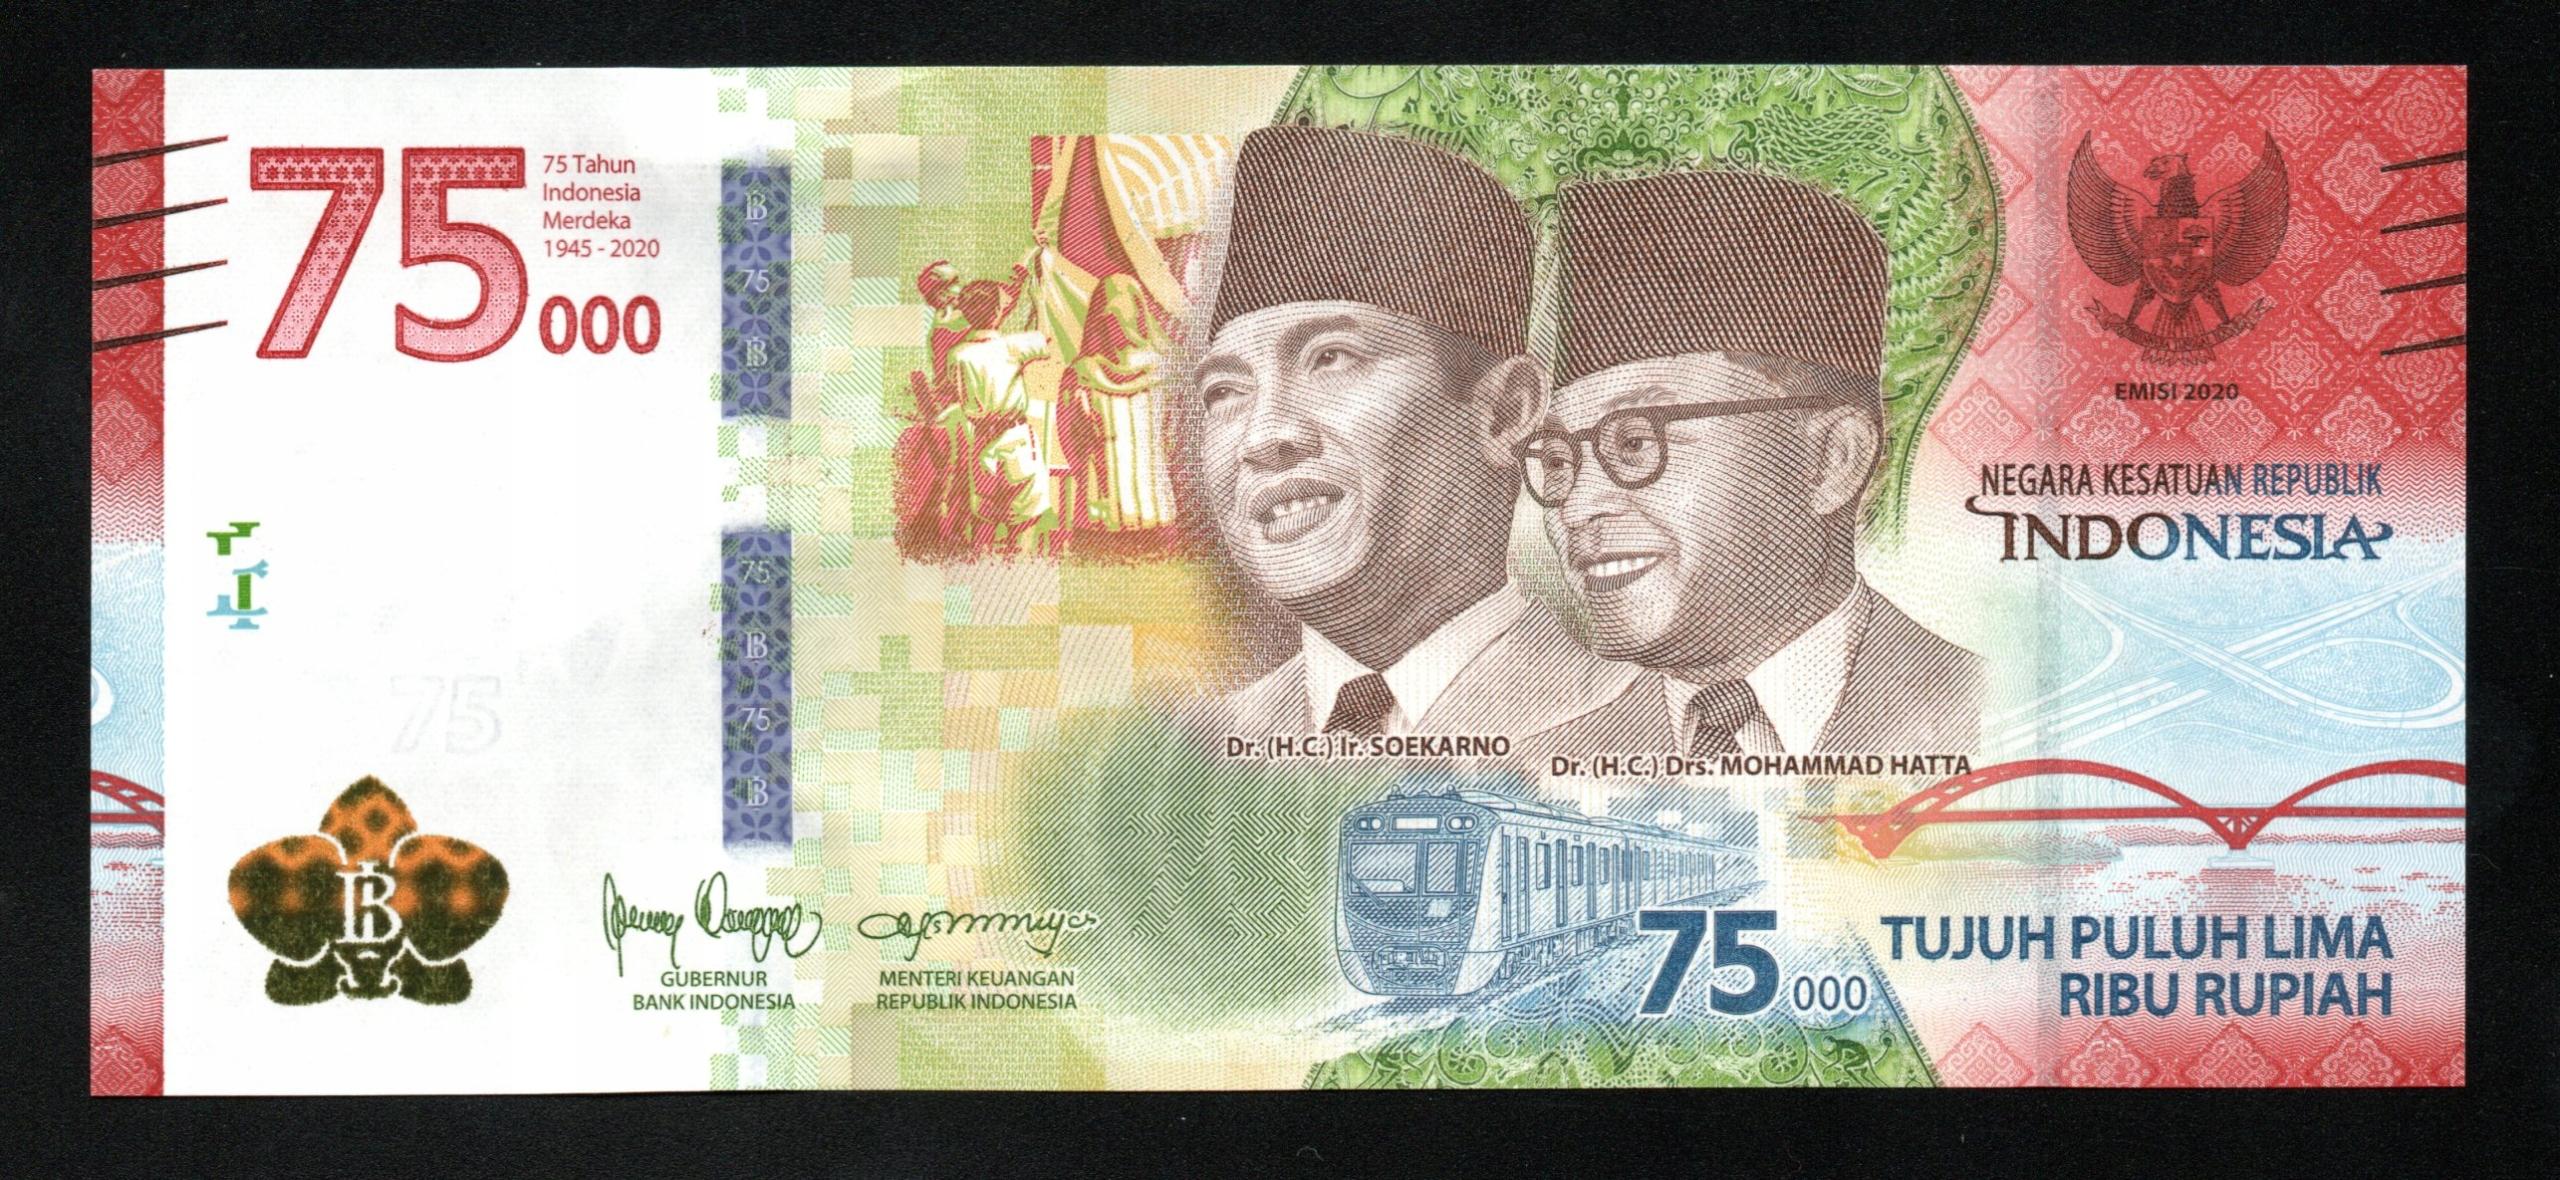 Индонезия 75000 RUPIAH P-161a UNC 2020 серии BAV